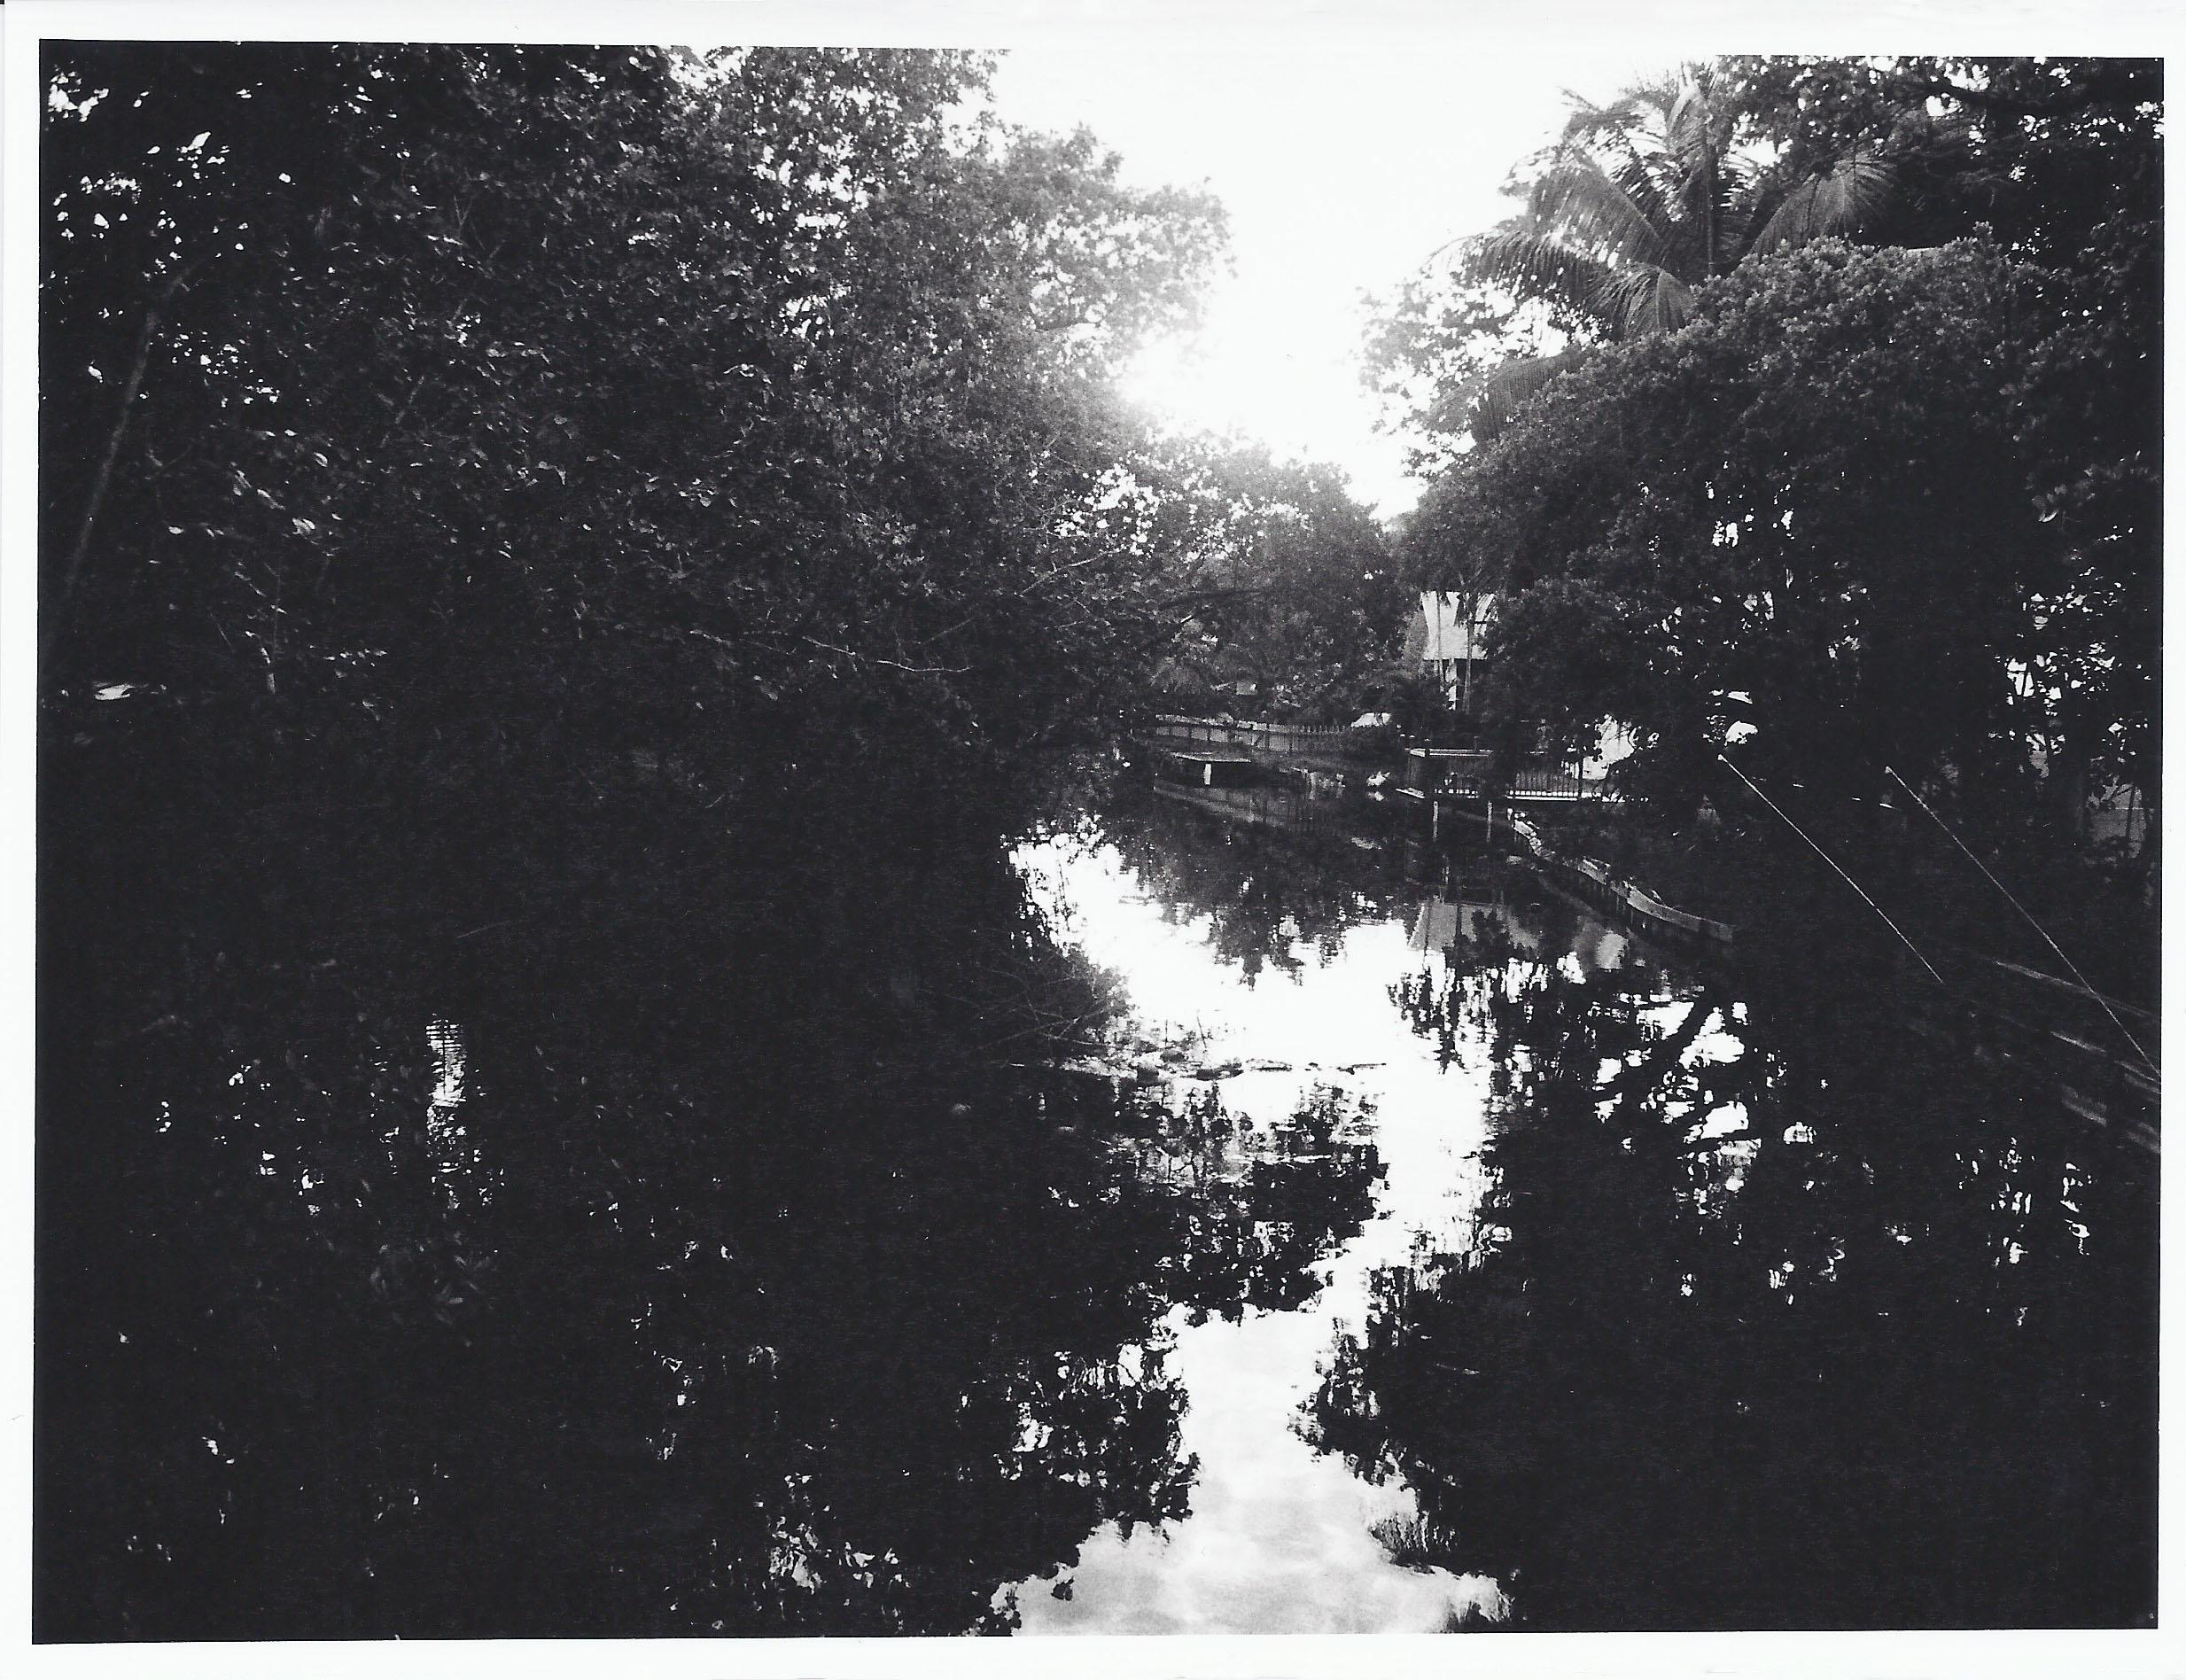 Reflections - Fiber Based